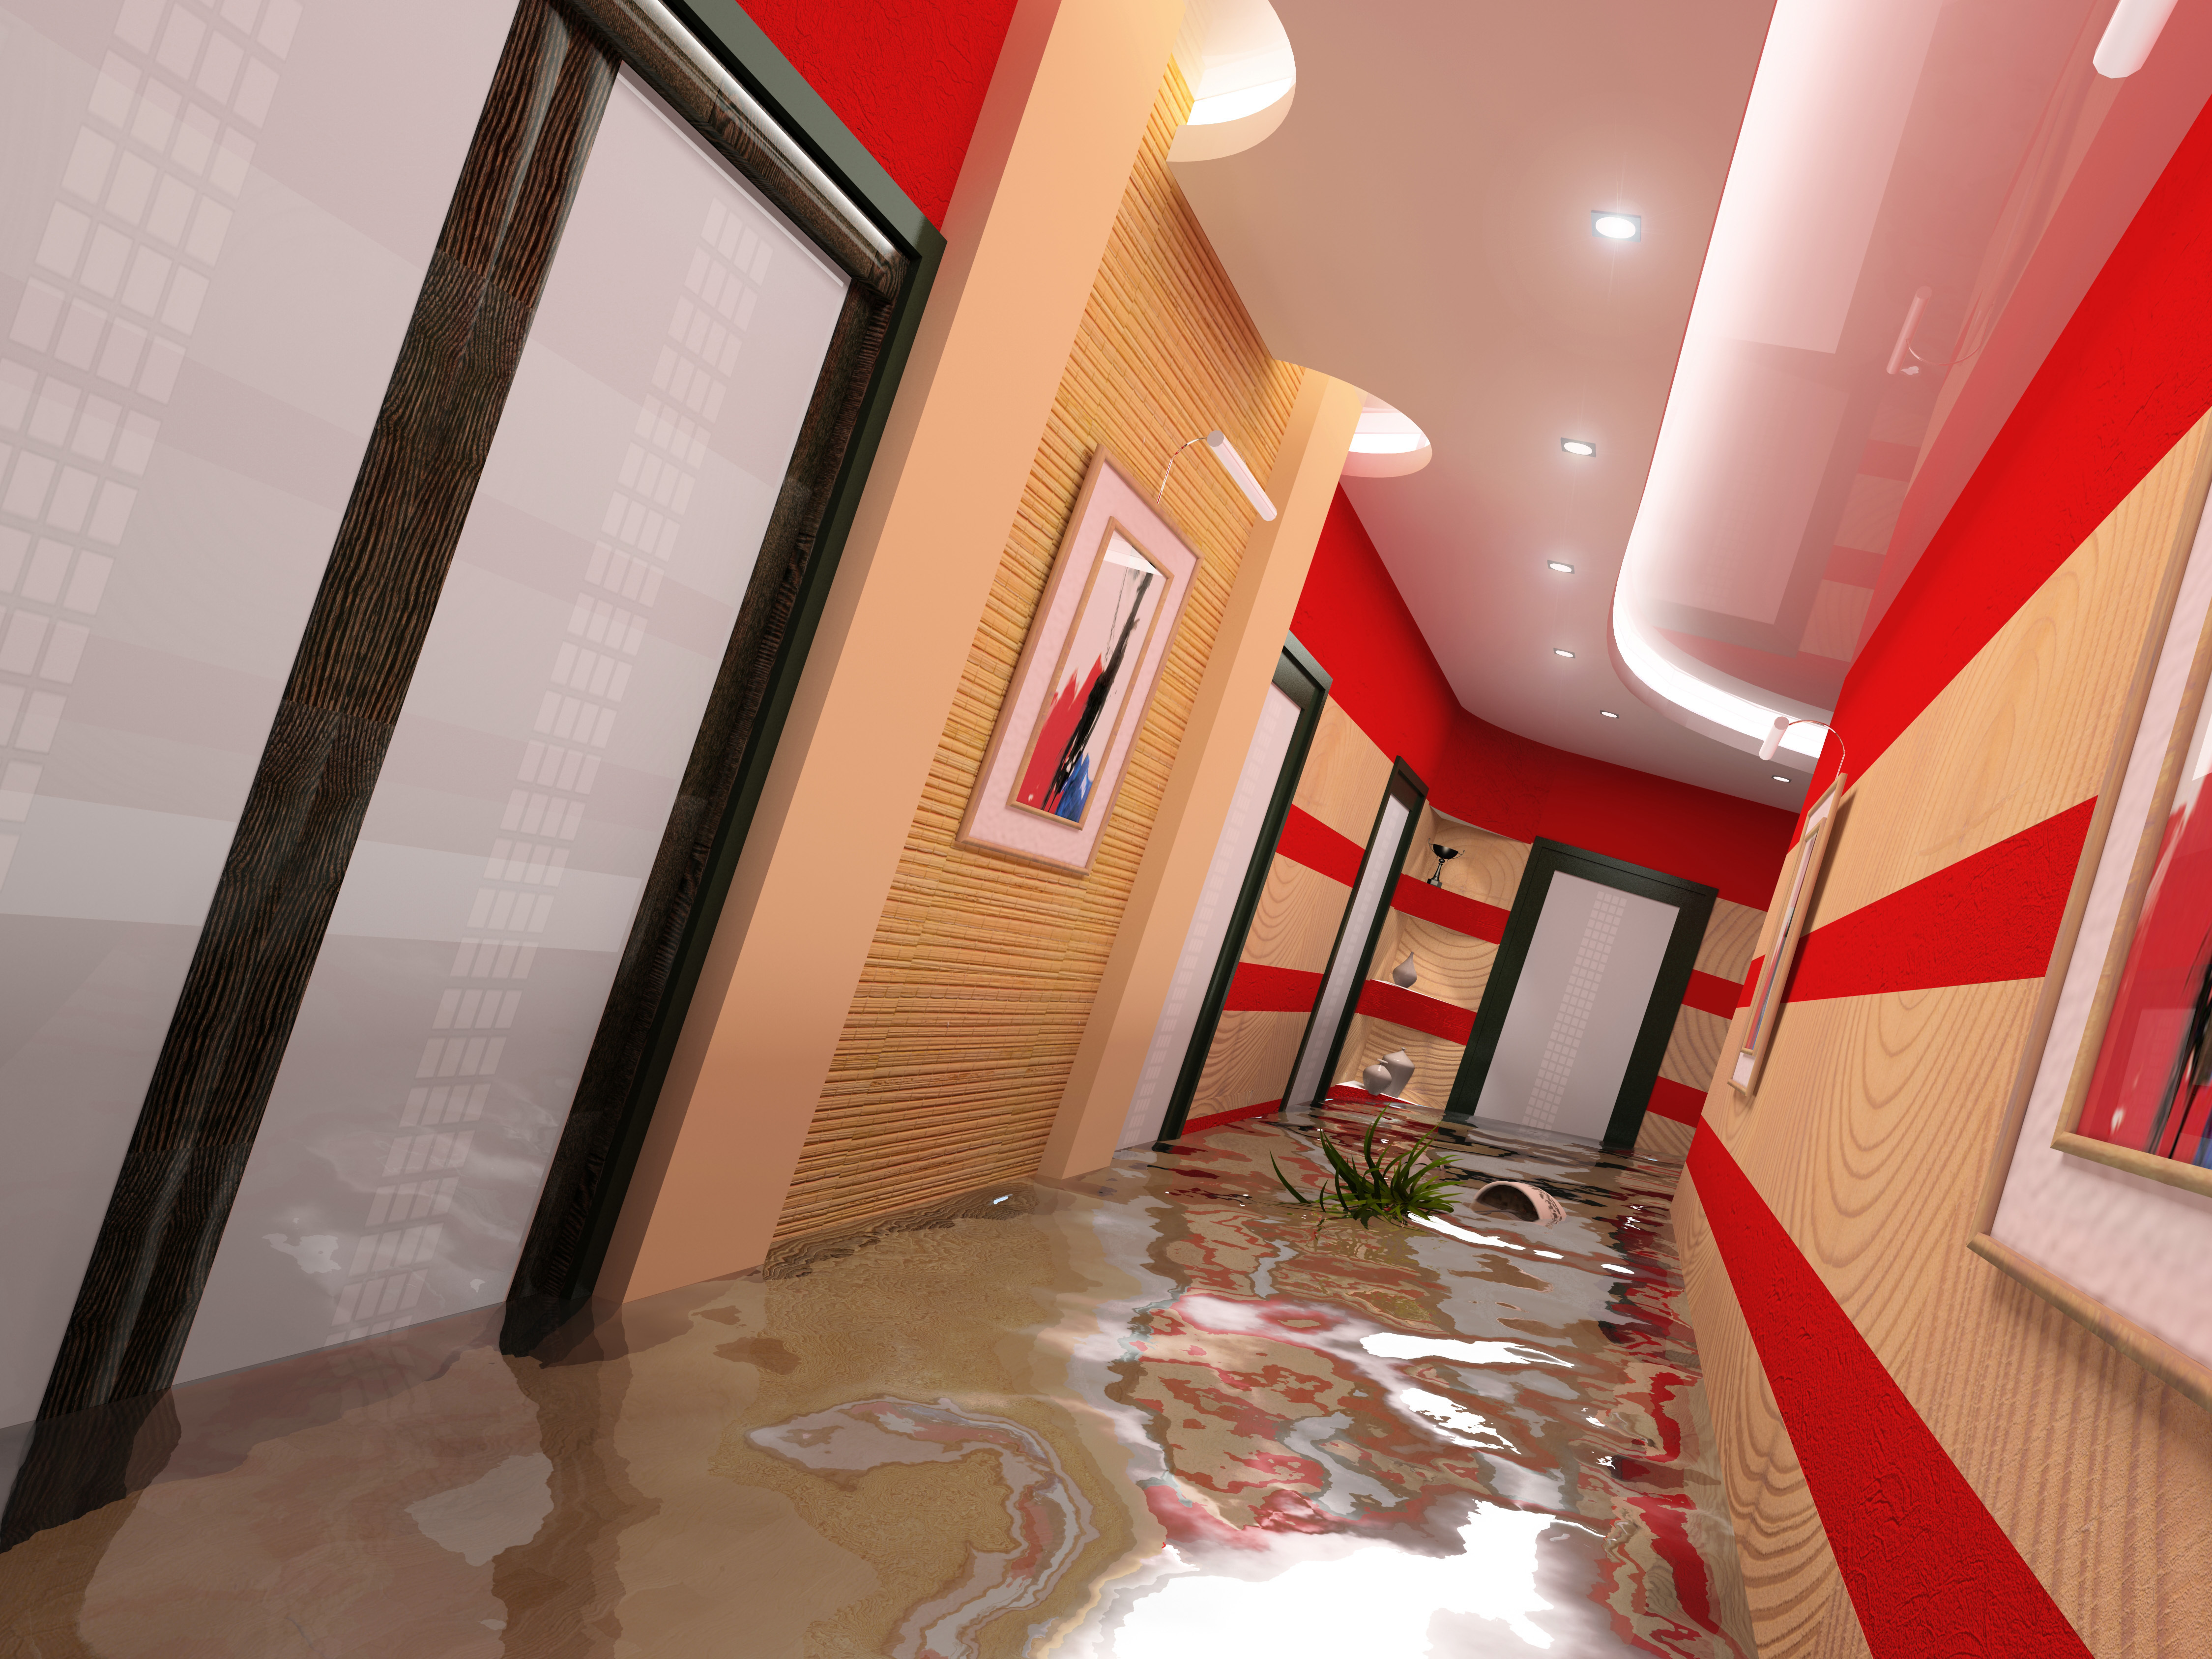 Flooded hotel corridor